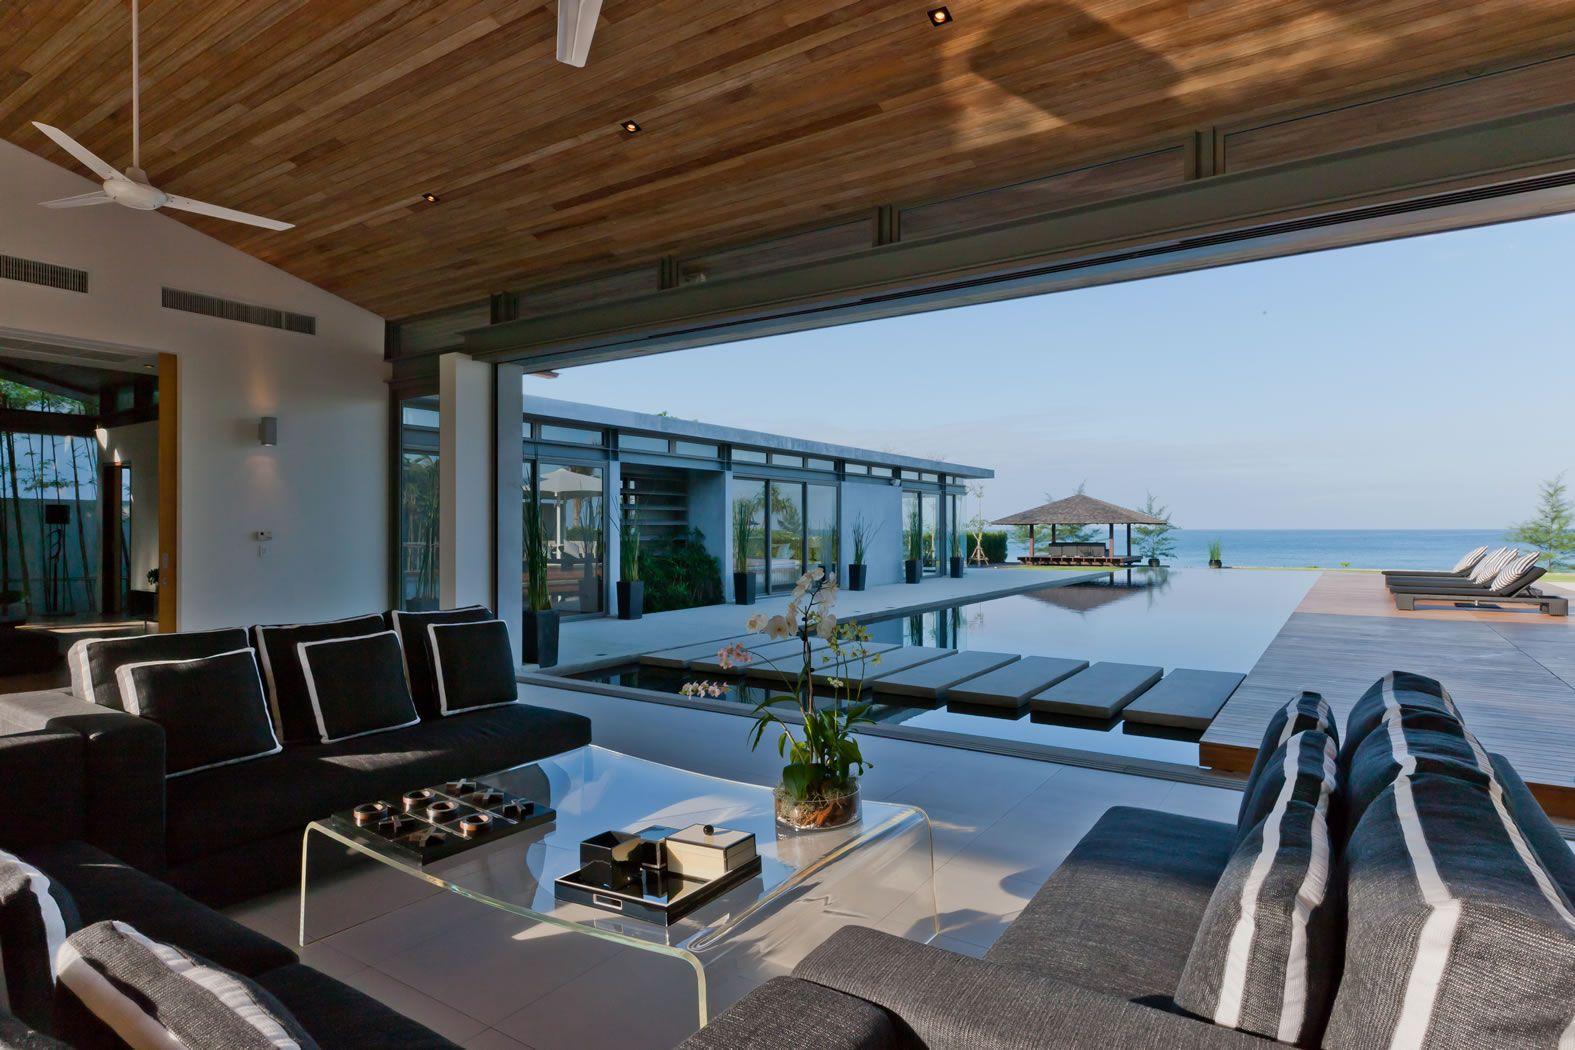 Sava Sai Architecture Original Vision